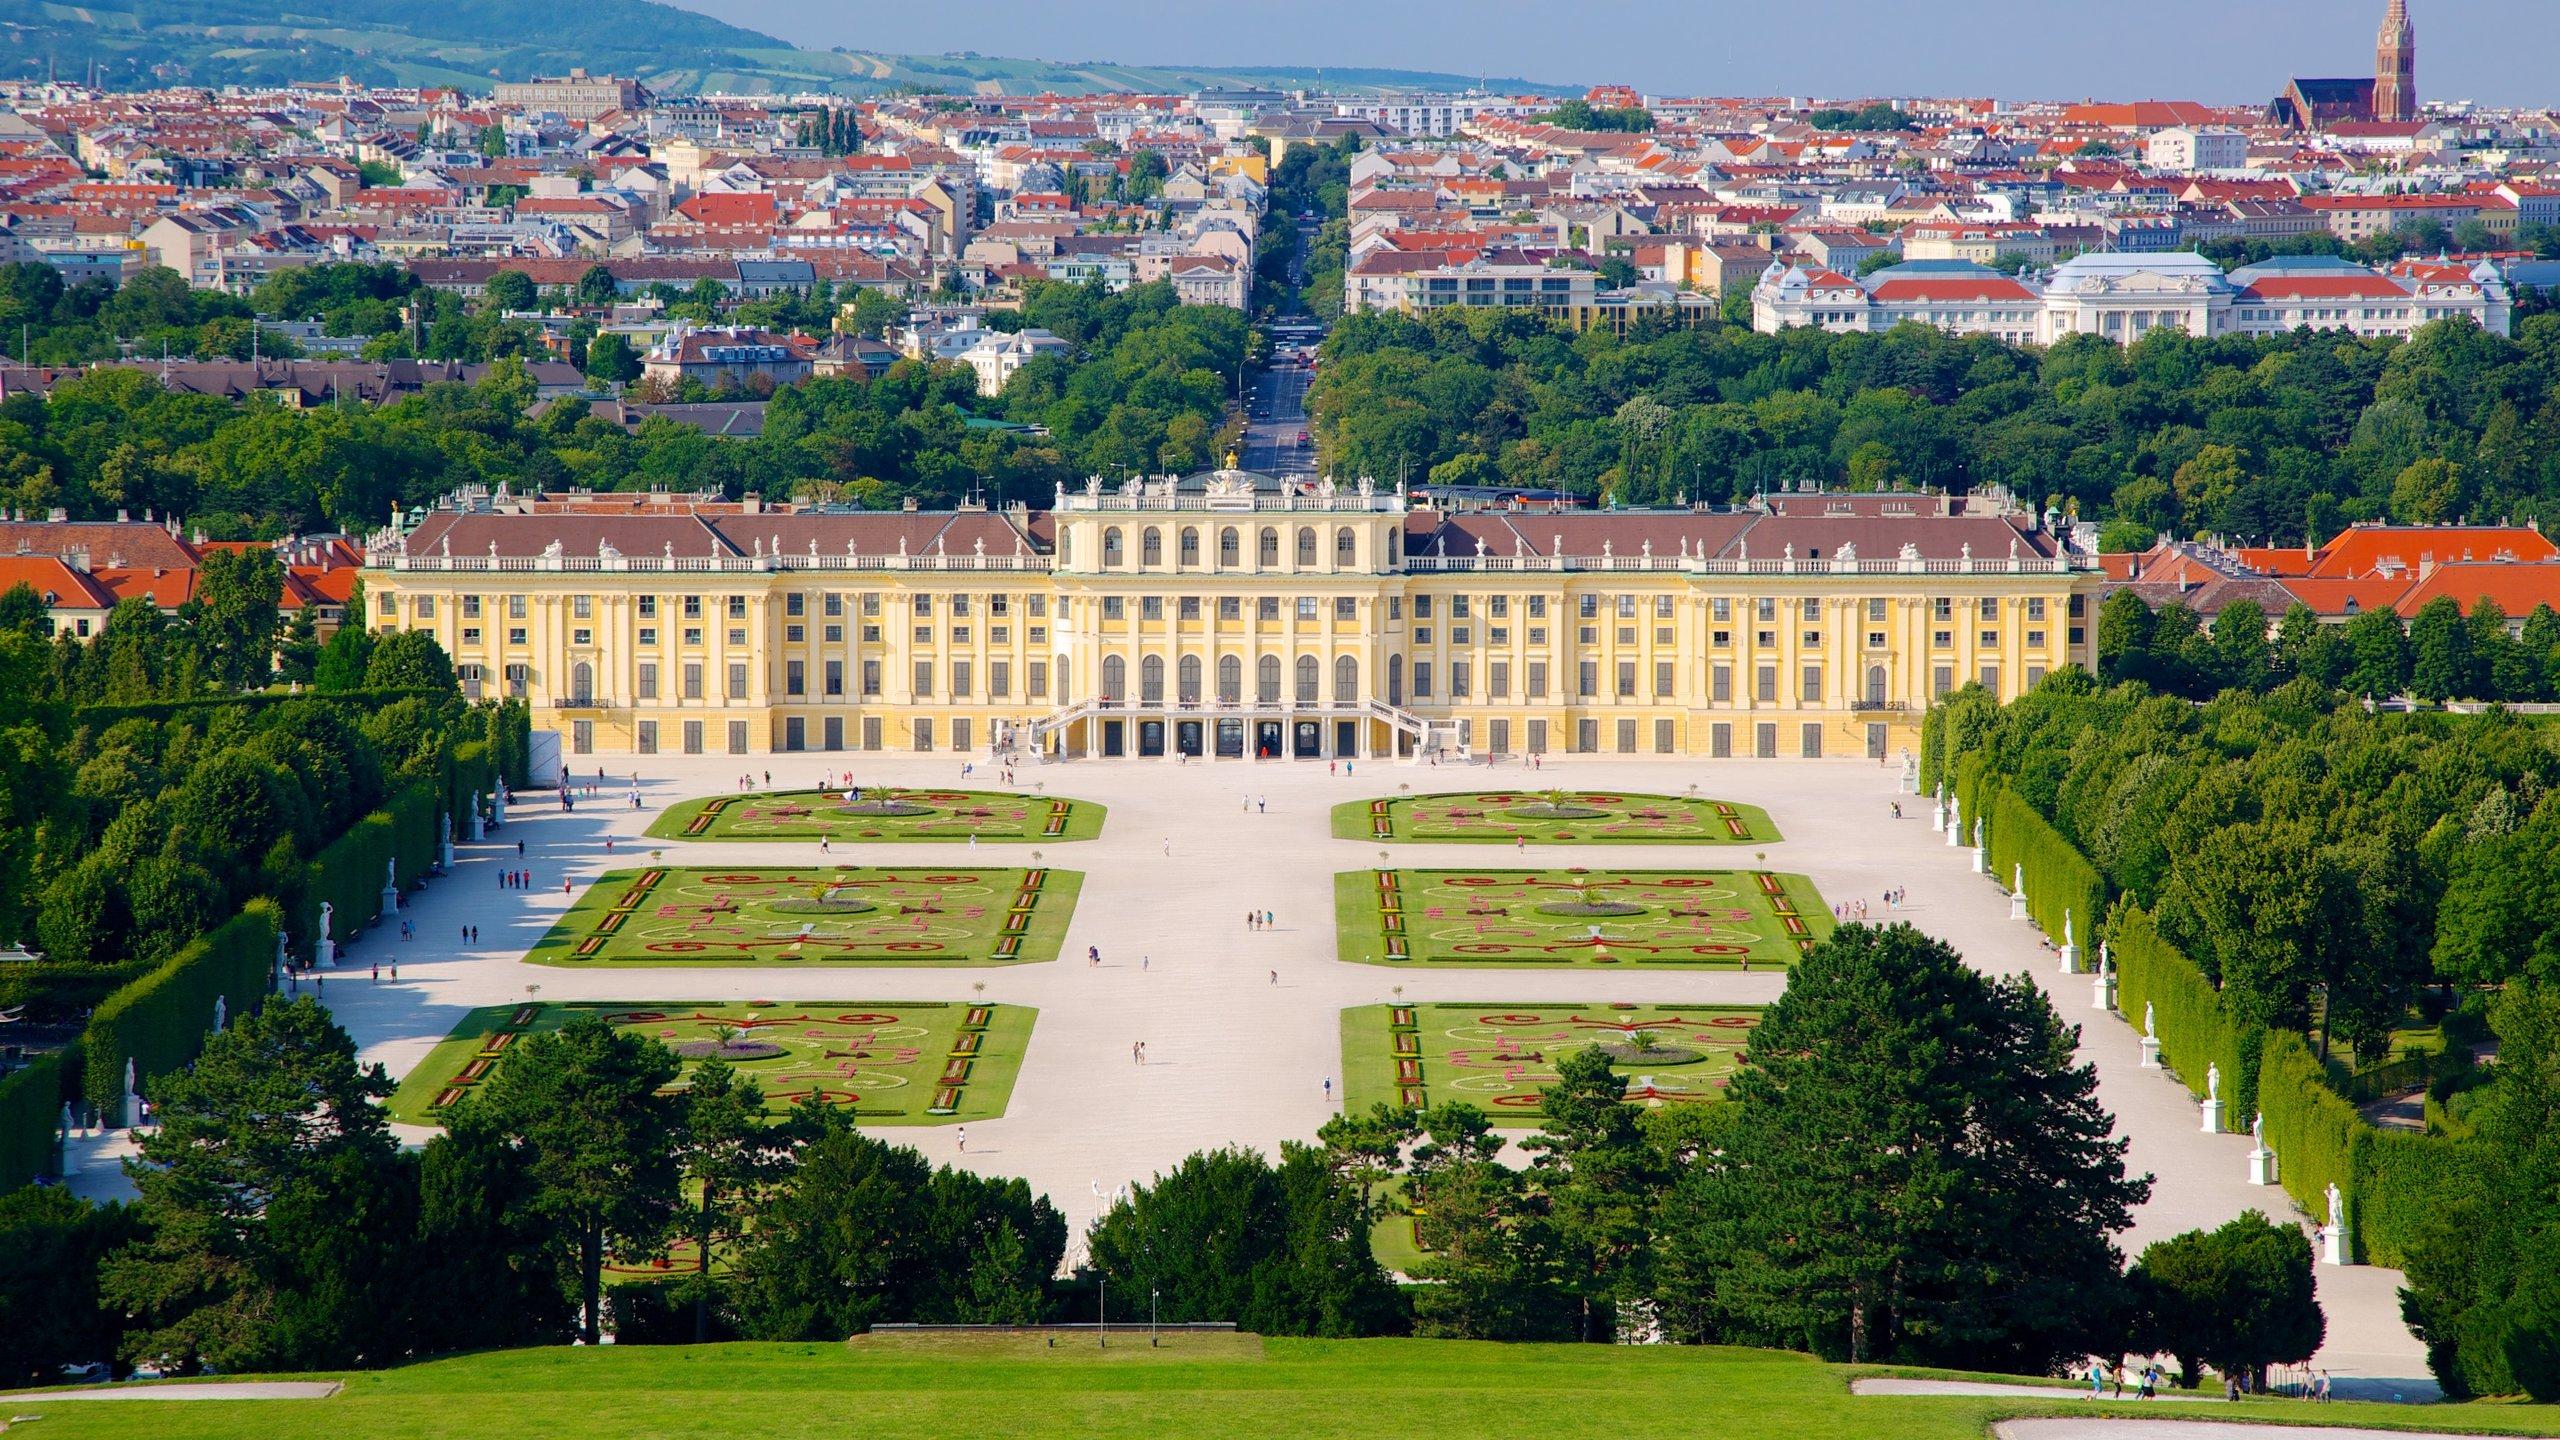 Hotel Wien Gunstig Buchen Hotels Expedia De